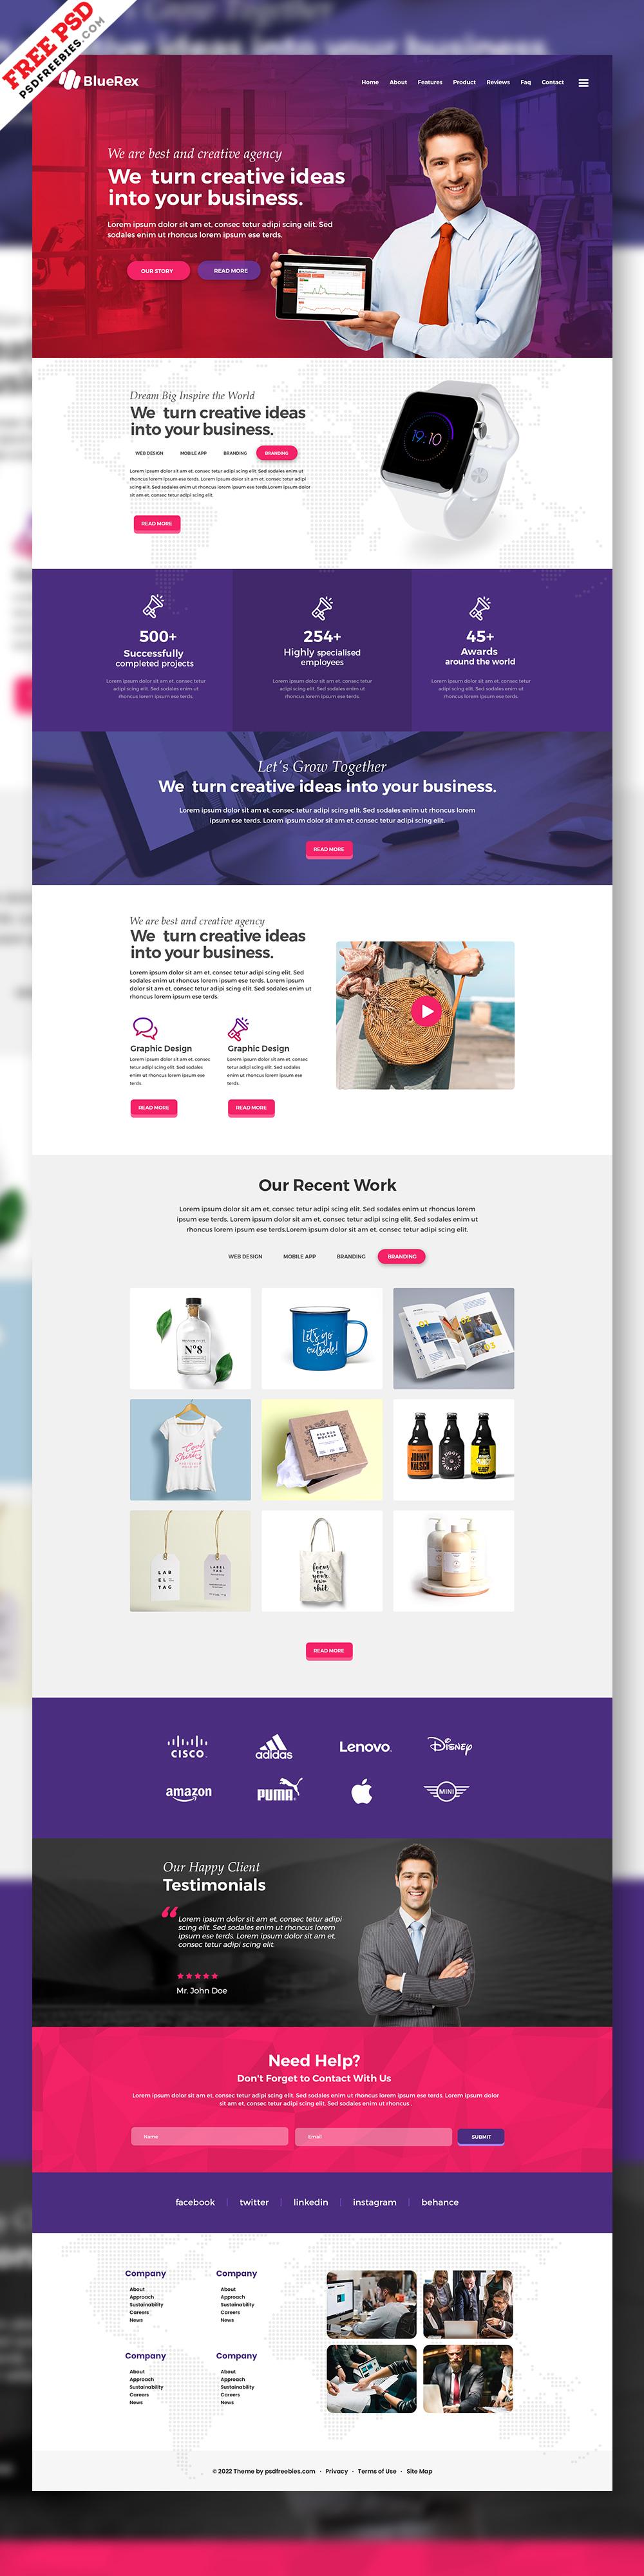 Creative Agency Web Design Free PSD